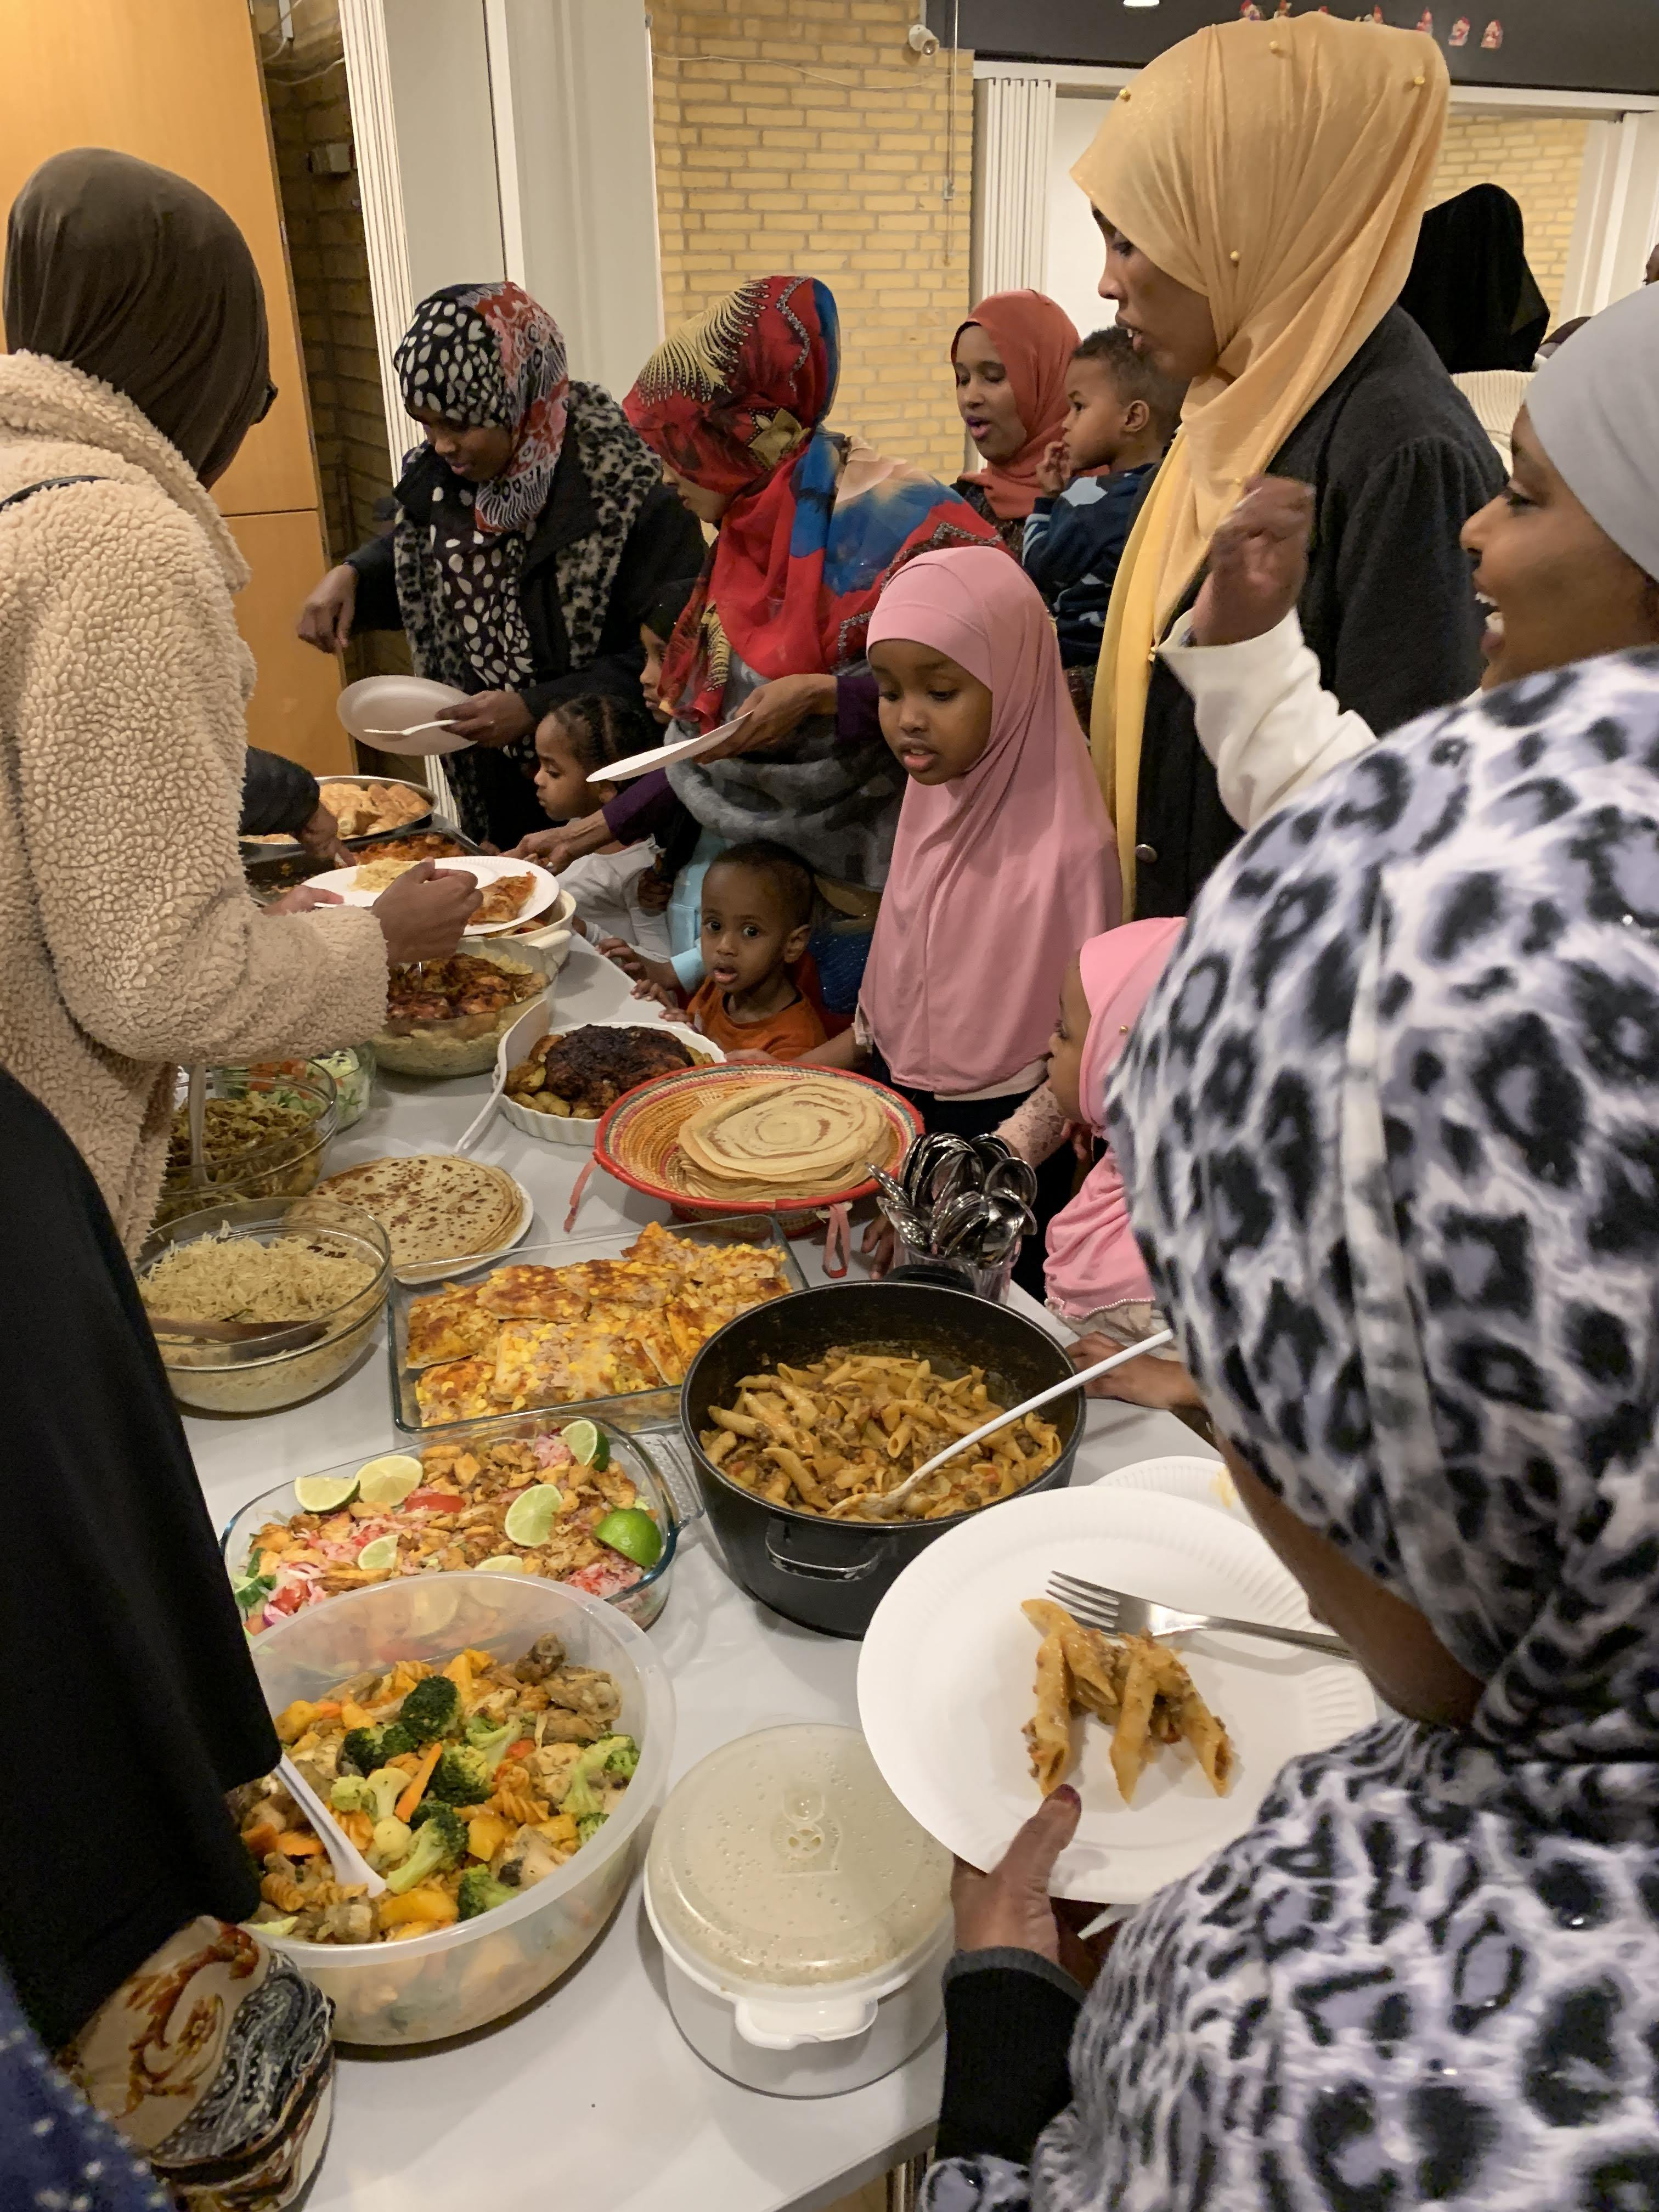 fællesspisning-den-28-12-2019-i-beboerhuset-på-Ellekonebakken-026